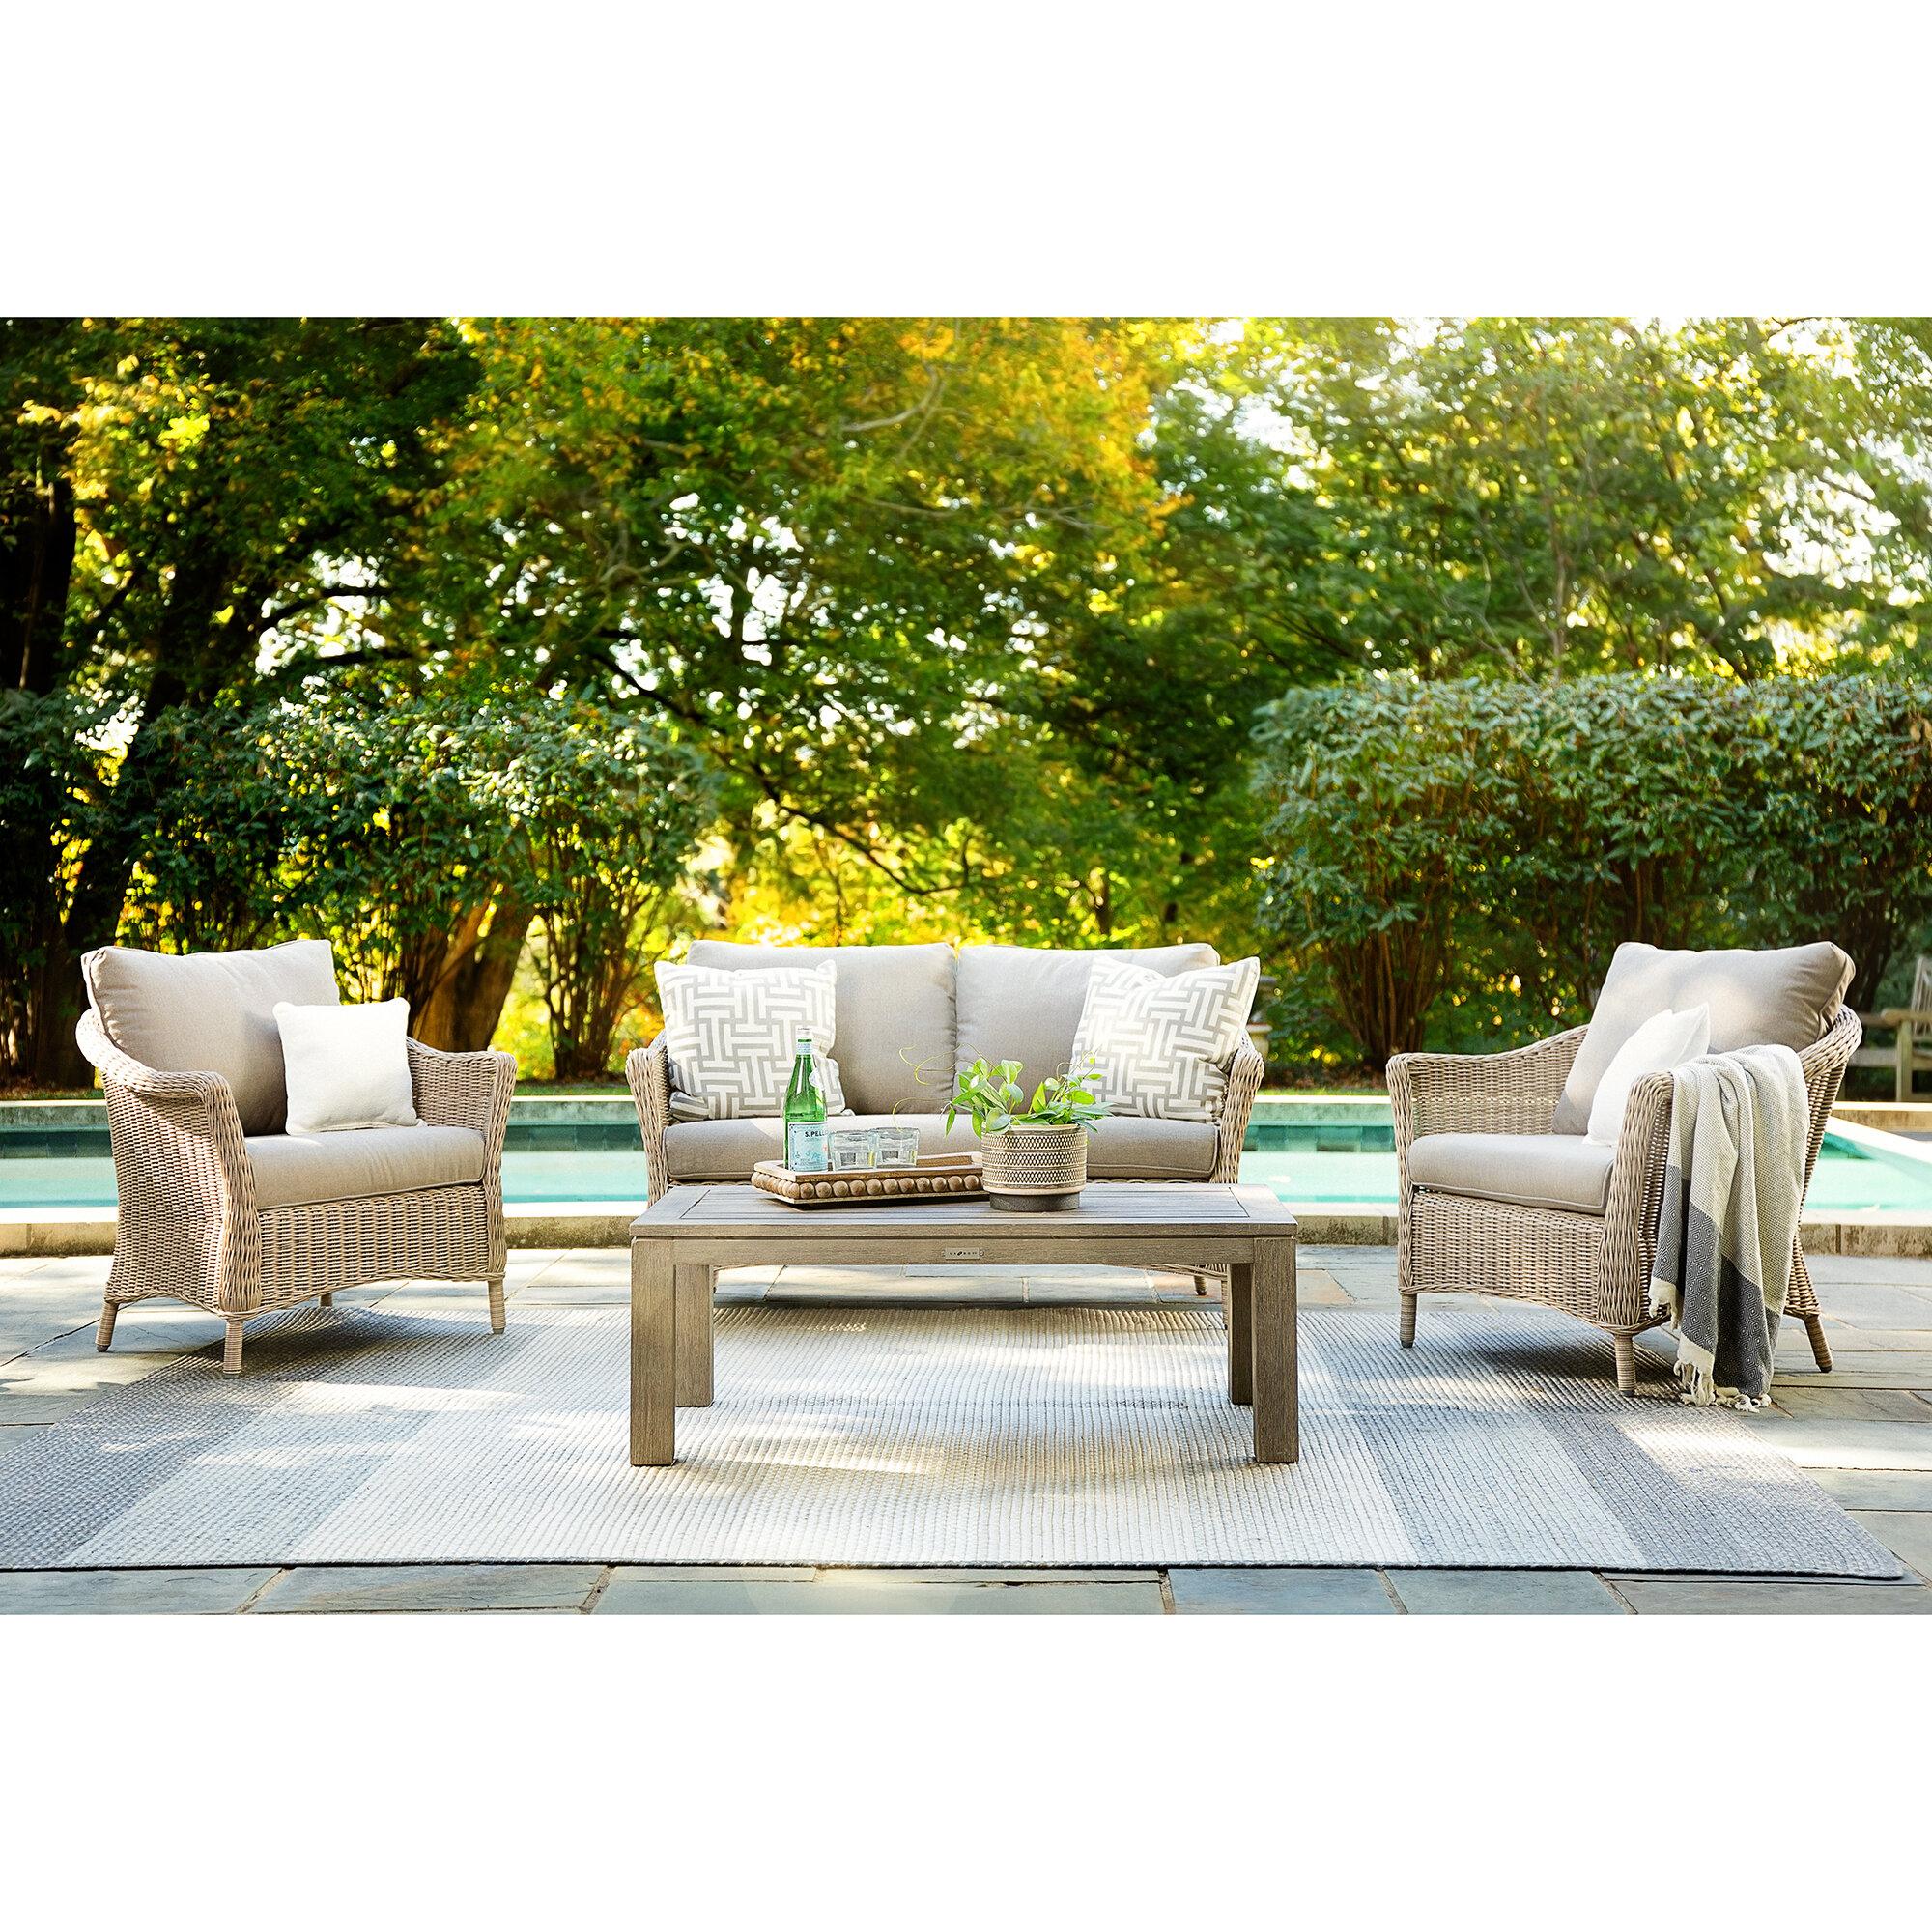 La Z Boy Laurel Lounge Seating Group With Sunbrella Cushions Reviews Wayfair